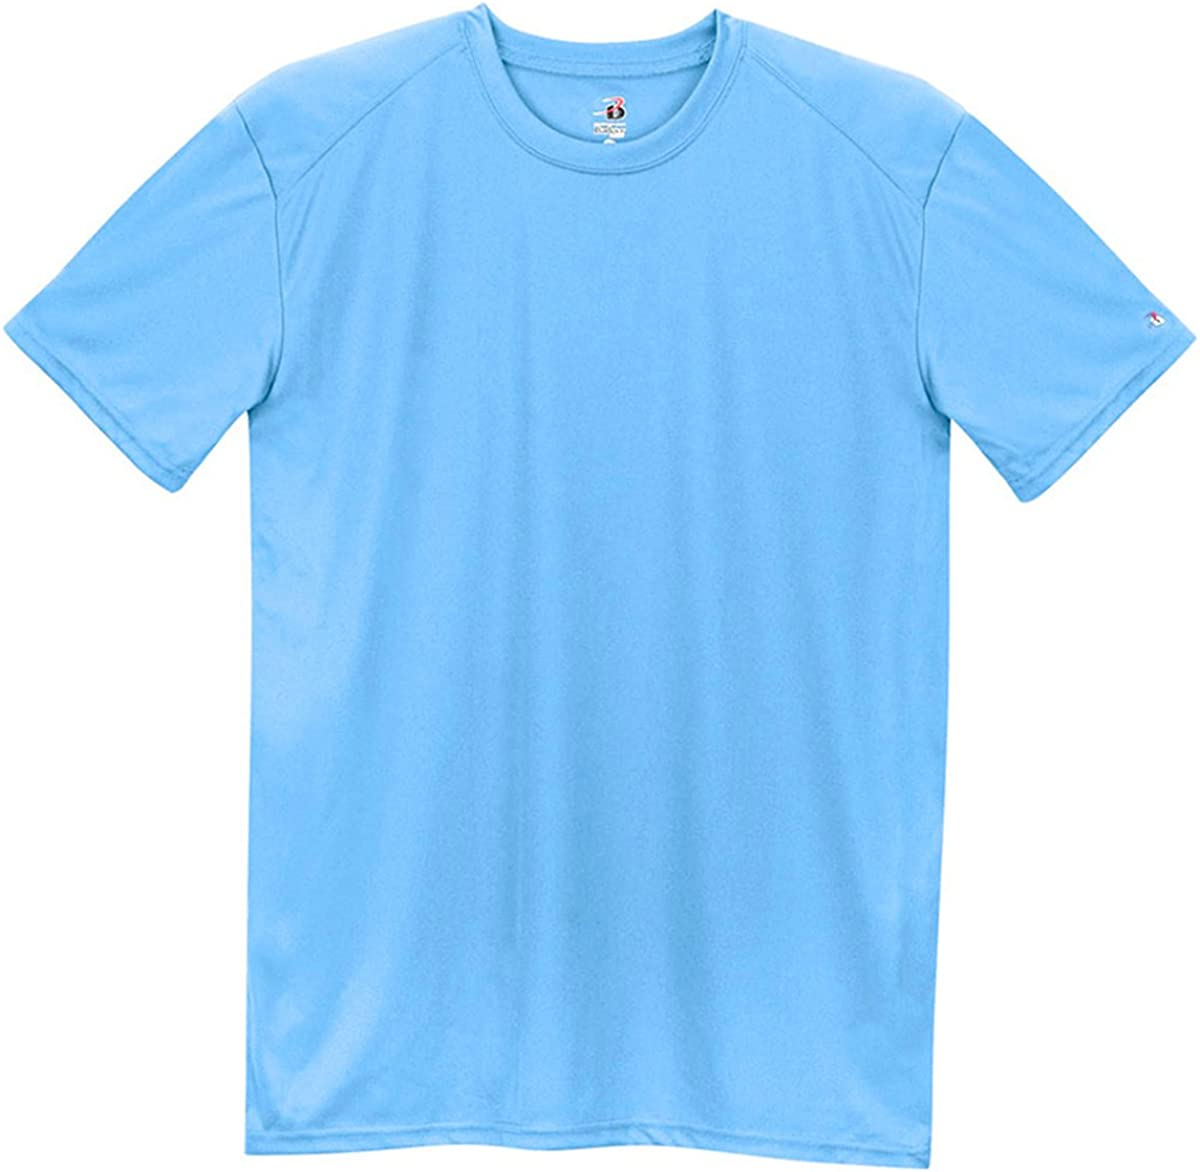 Badger 2120 B-Core Youth Short Sleeve T-Shirt